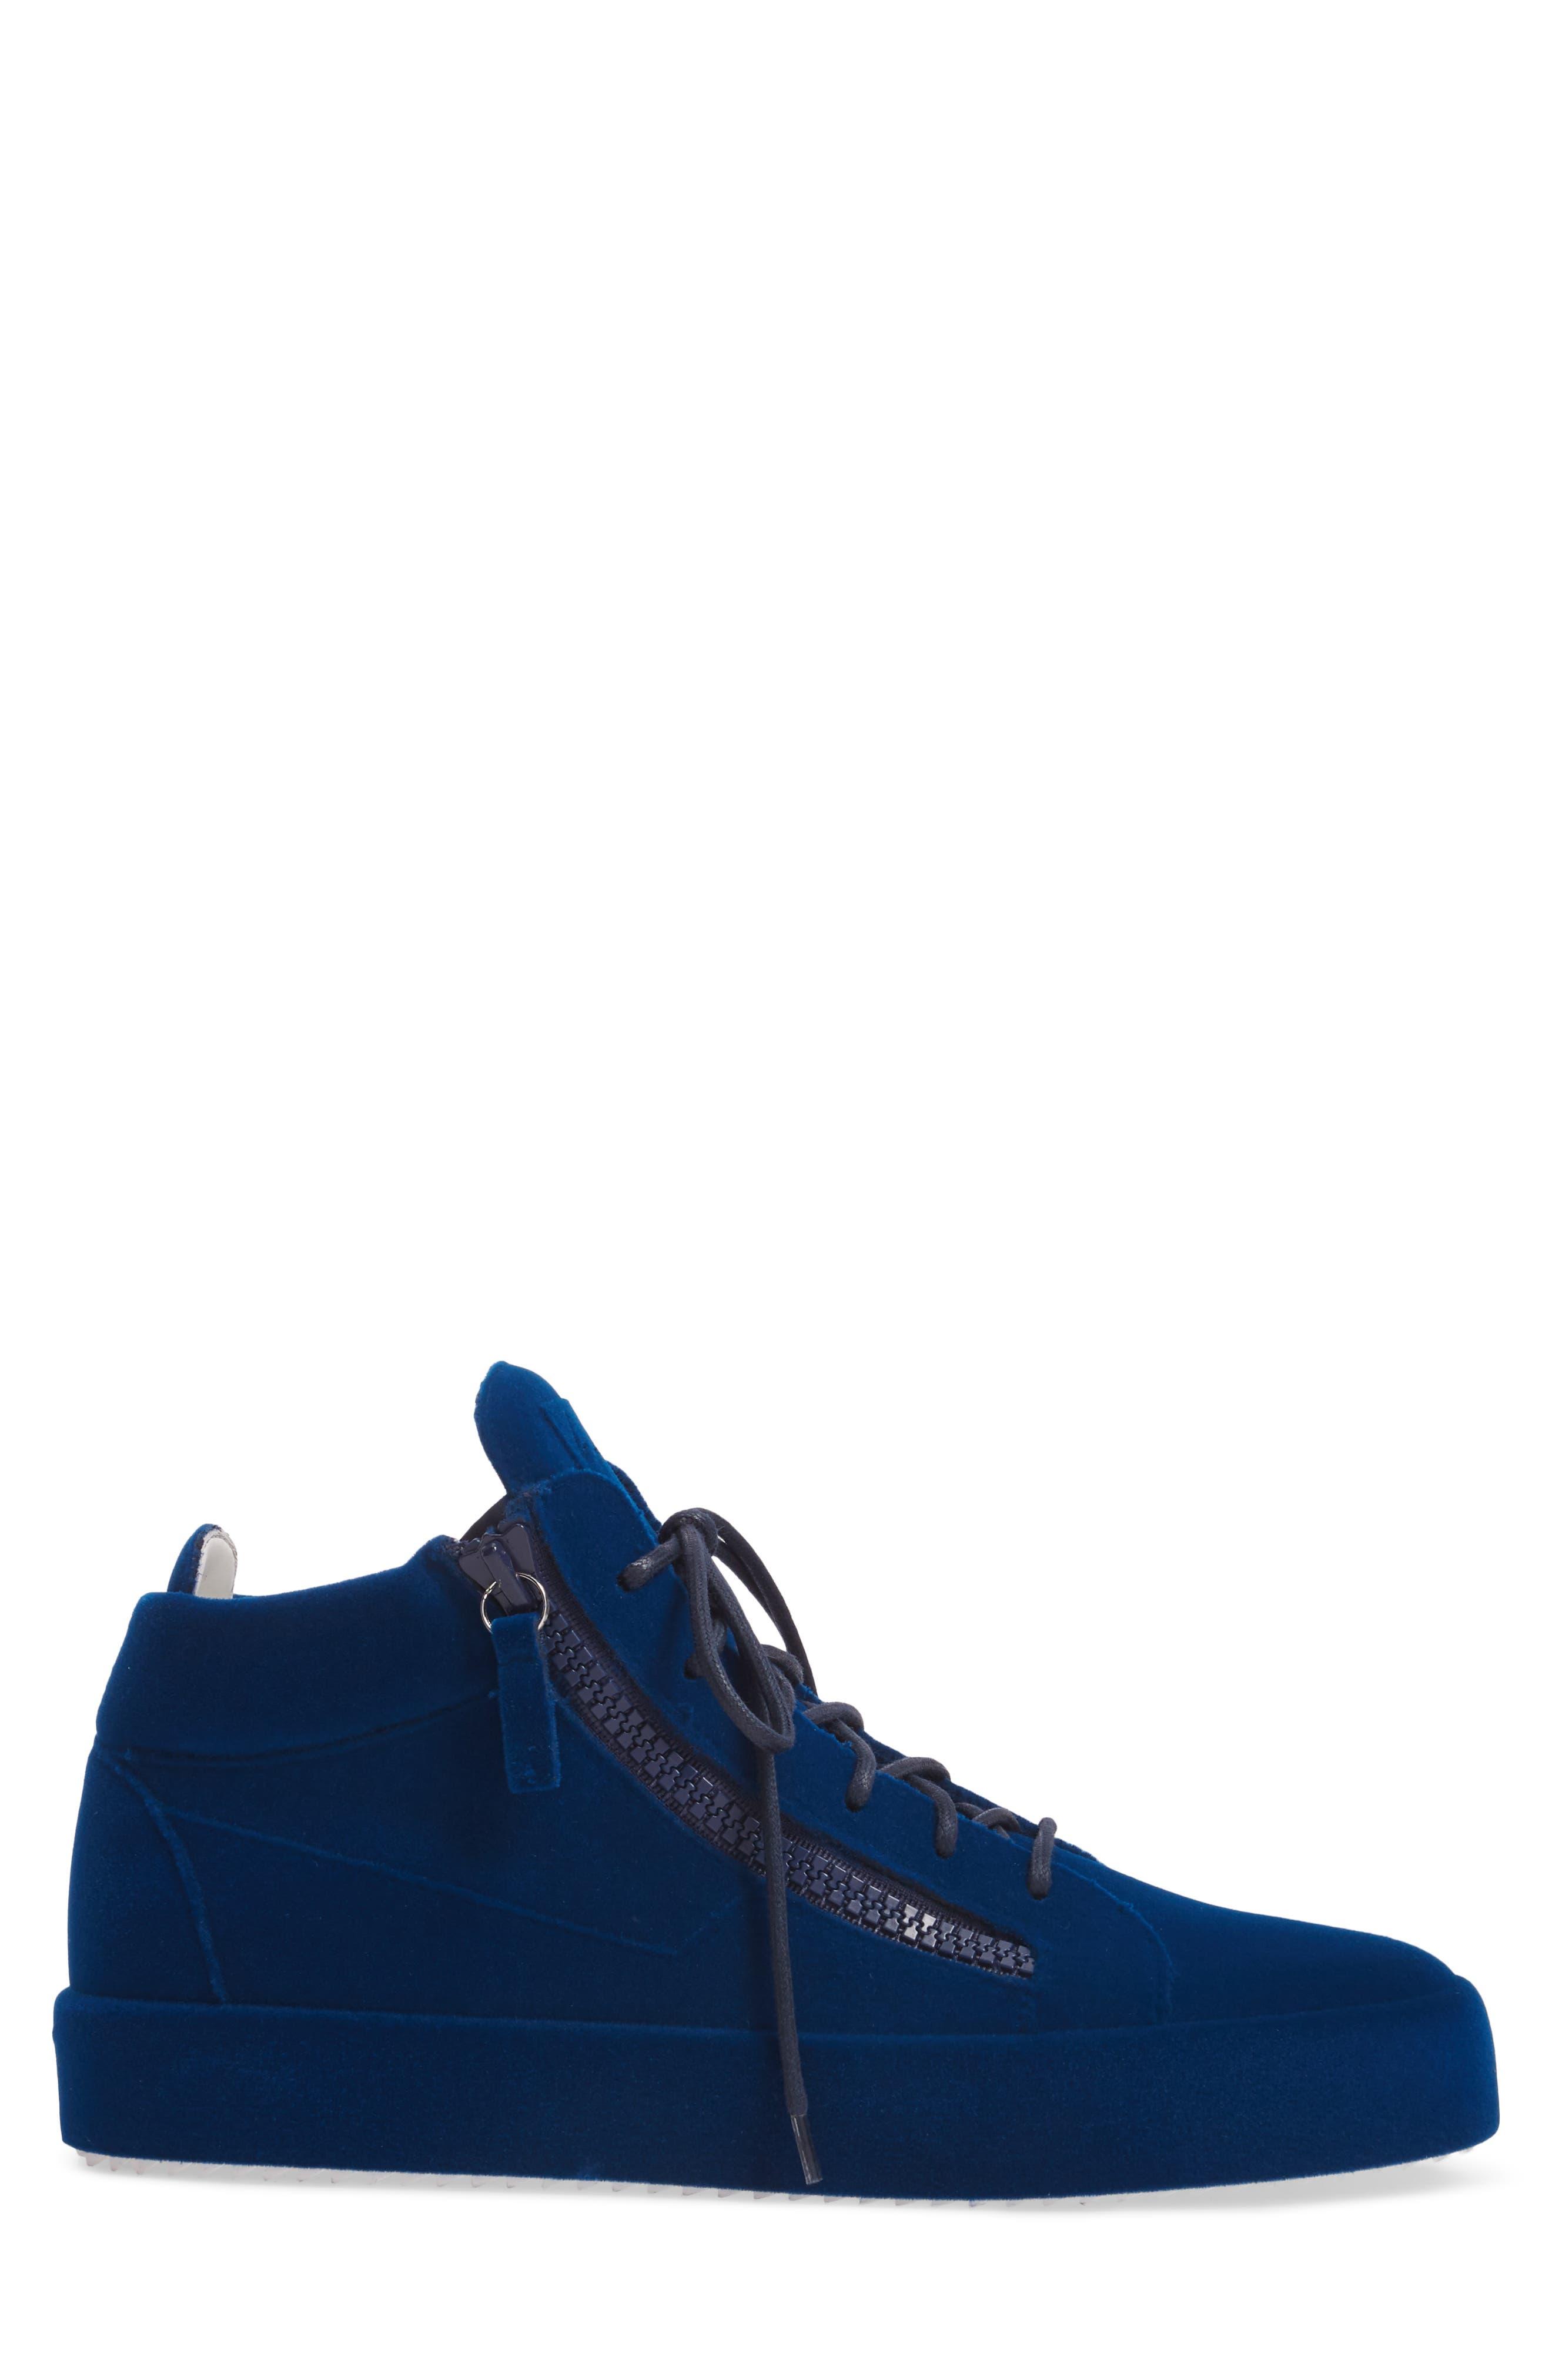 Mid Top Sneaker,                             Alternate thumbnail 3, color,                             469